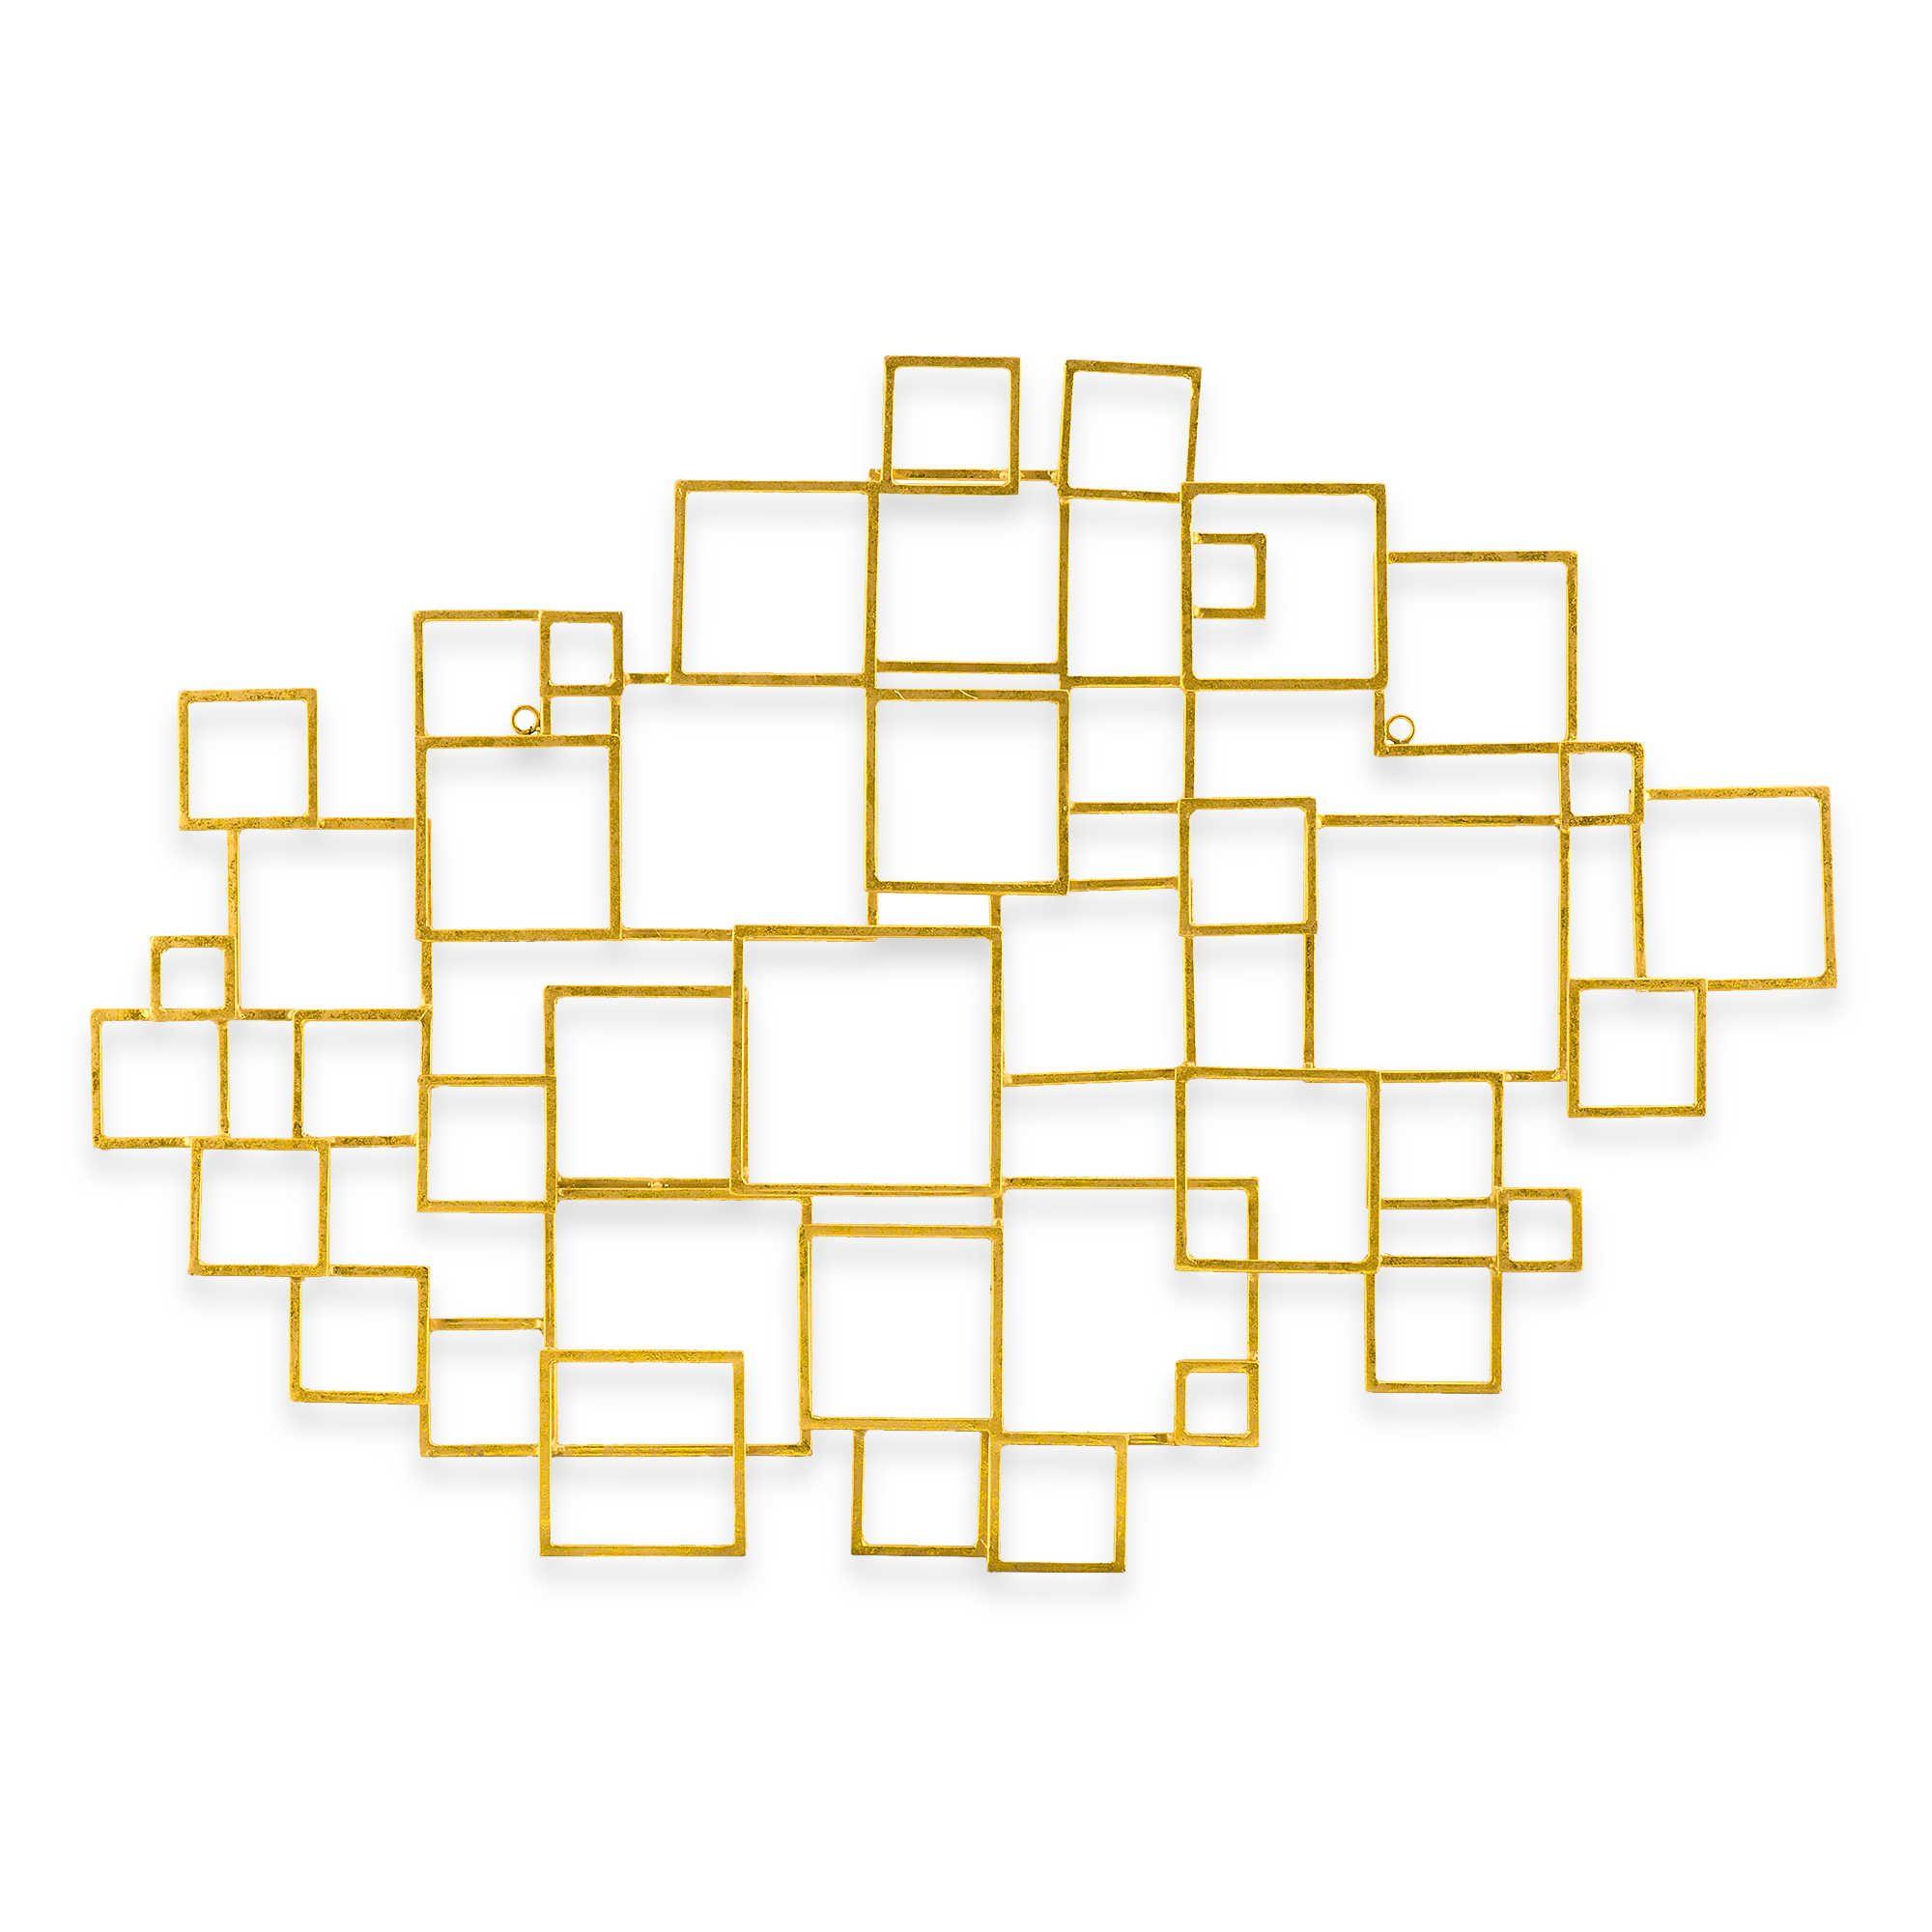 Luxury Wall Wire Art Motif - All About Wallart - adelgazare.info